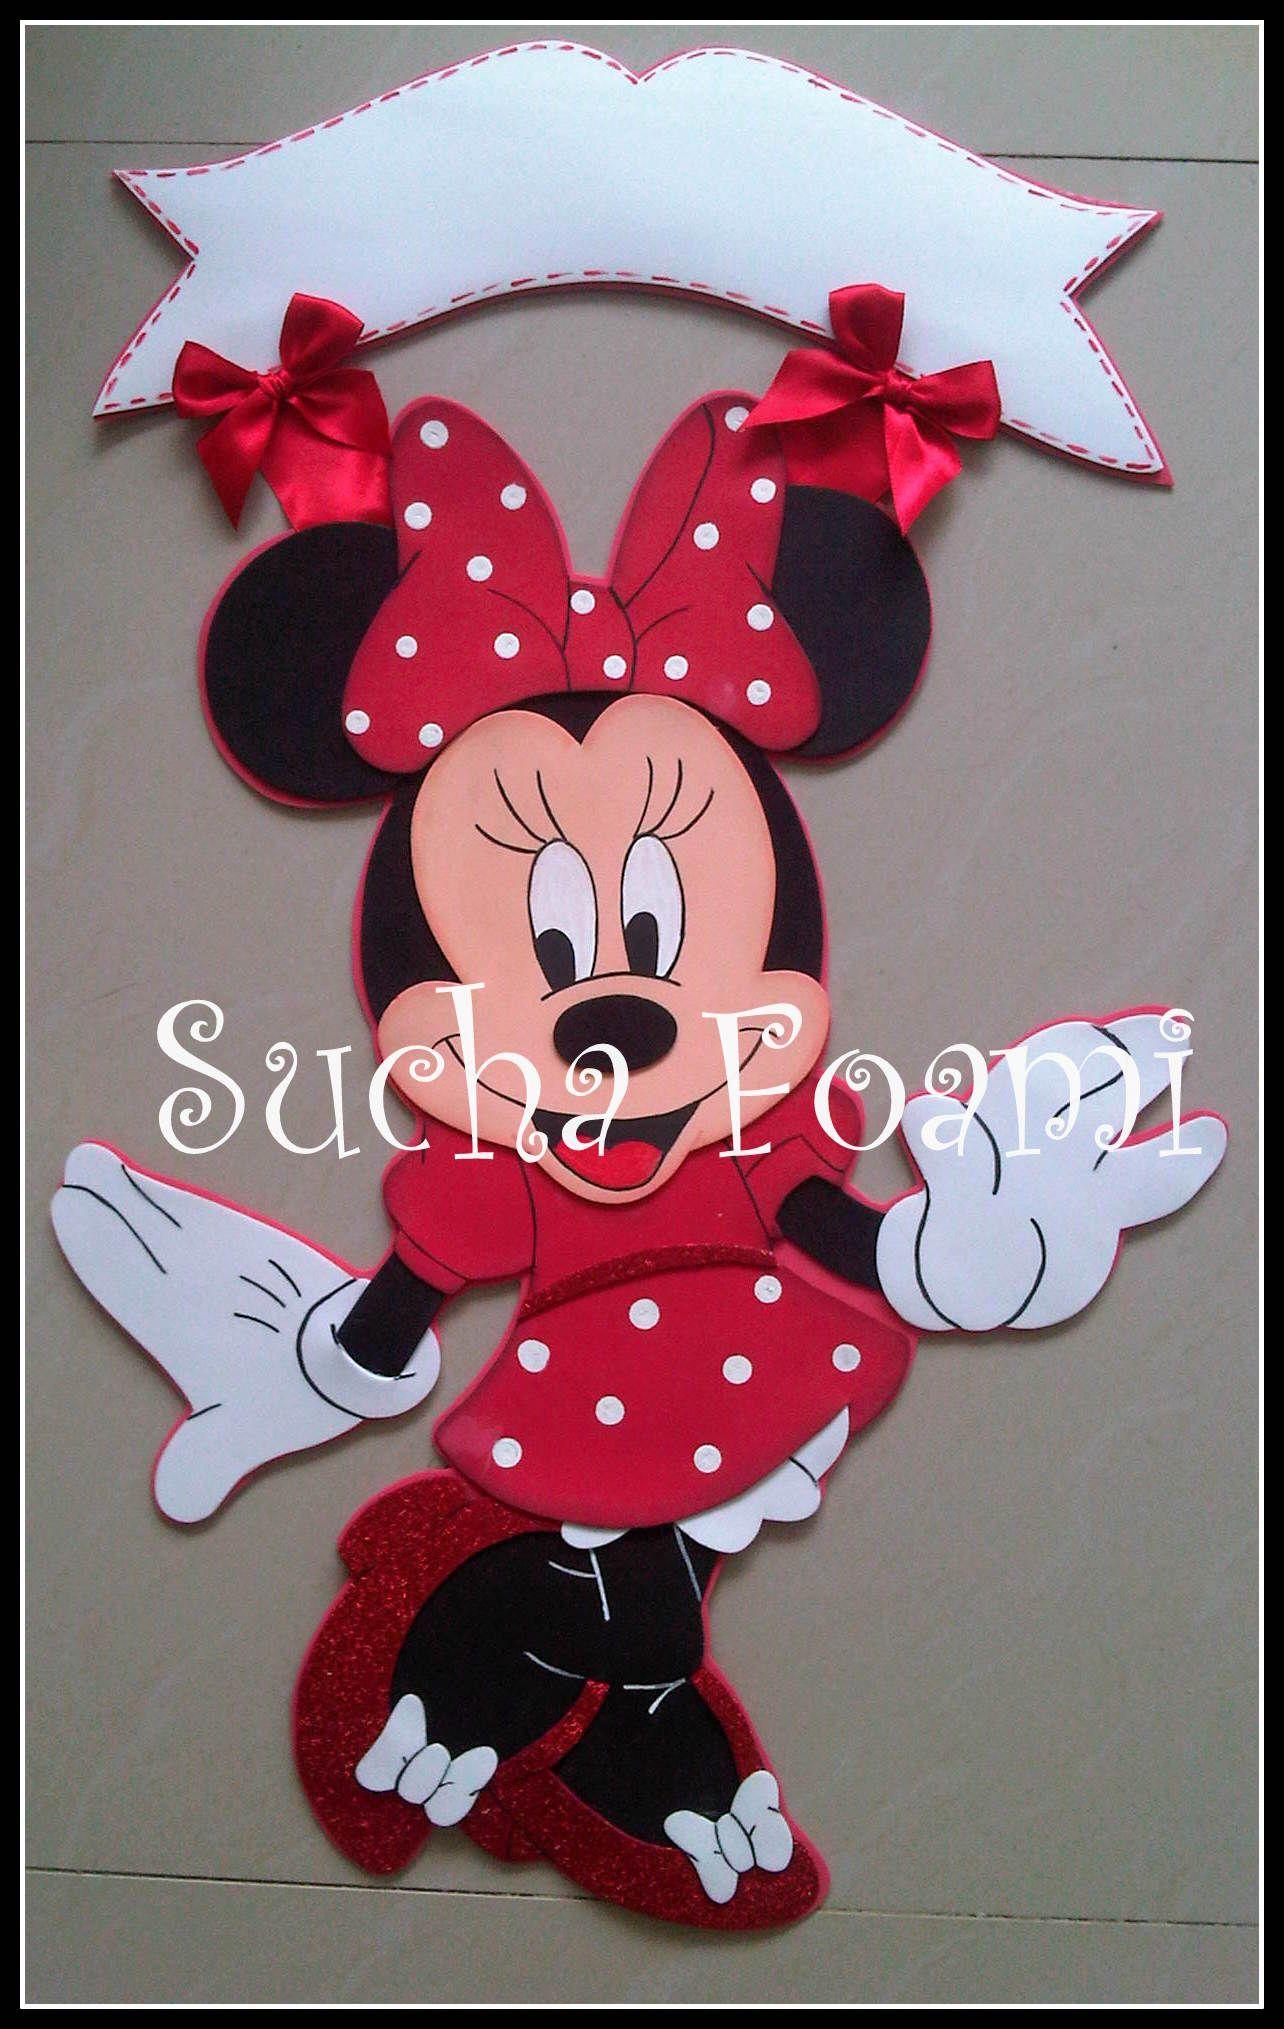 Fofuchas mis trabajos pinterest mice minnie mouse - Manualidades minnie mouse ...